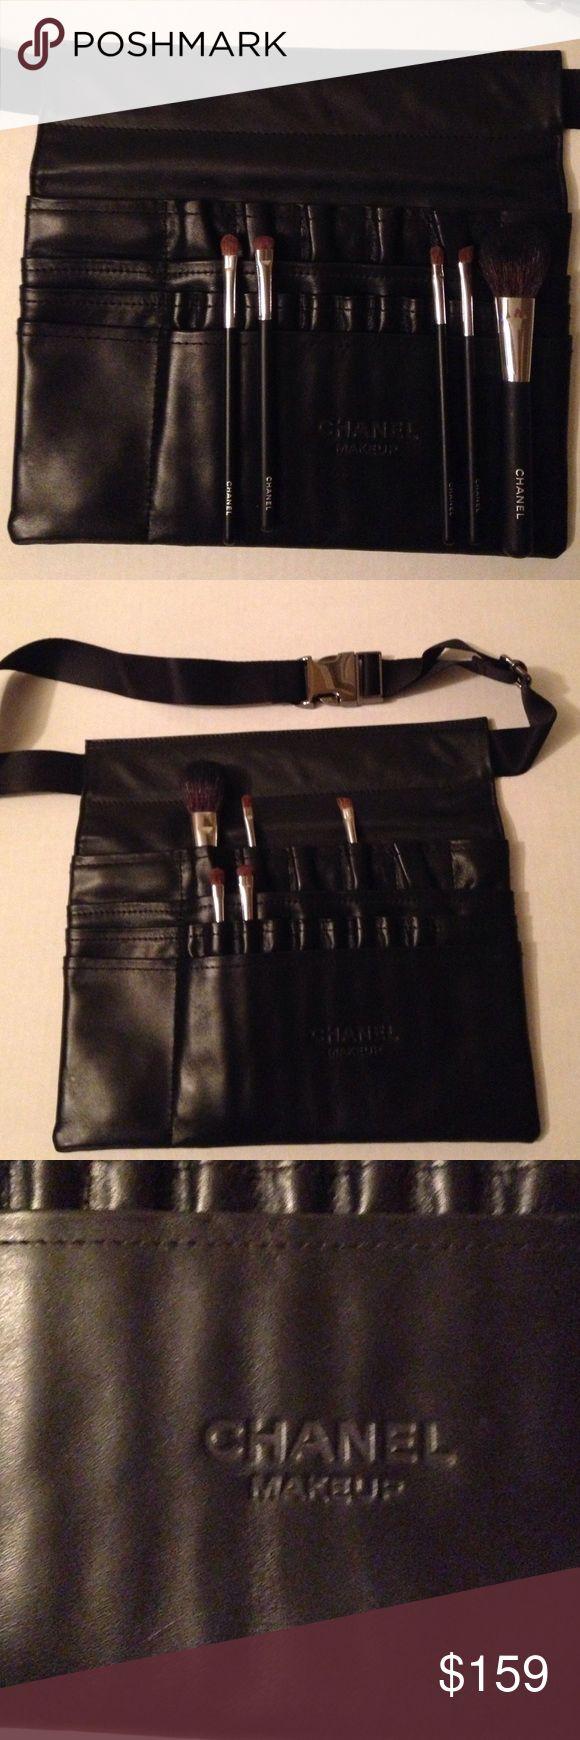 Professional Chanel makeup brush holder & brushes Chanel